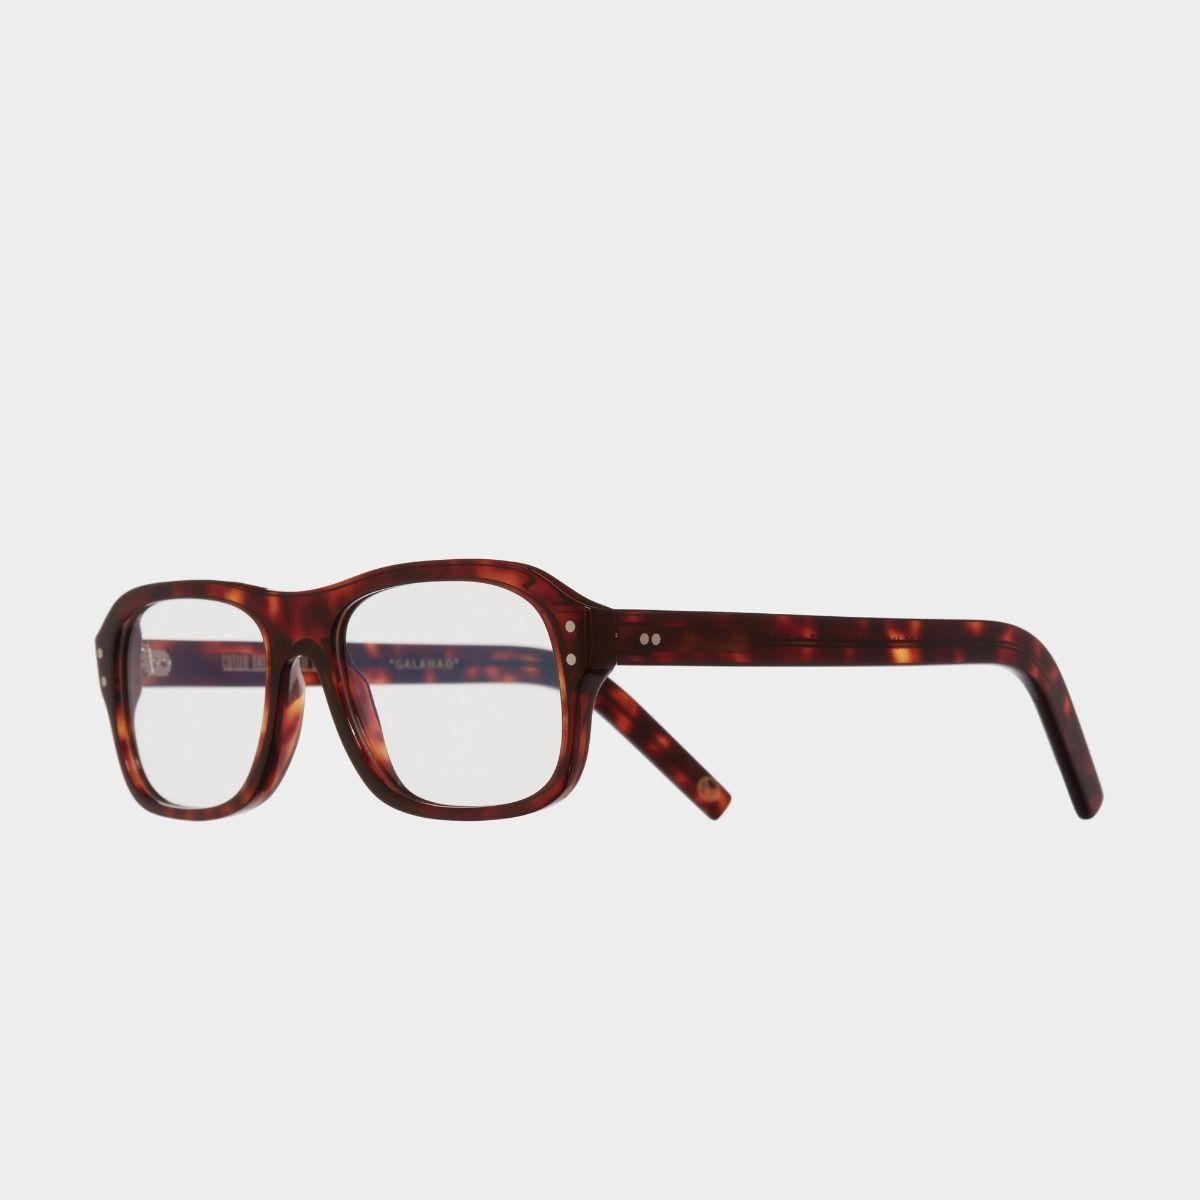 0847V2 Kingsman Optical Aviator Glasses (Large)